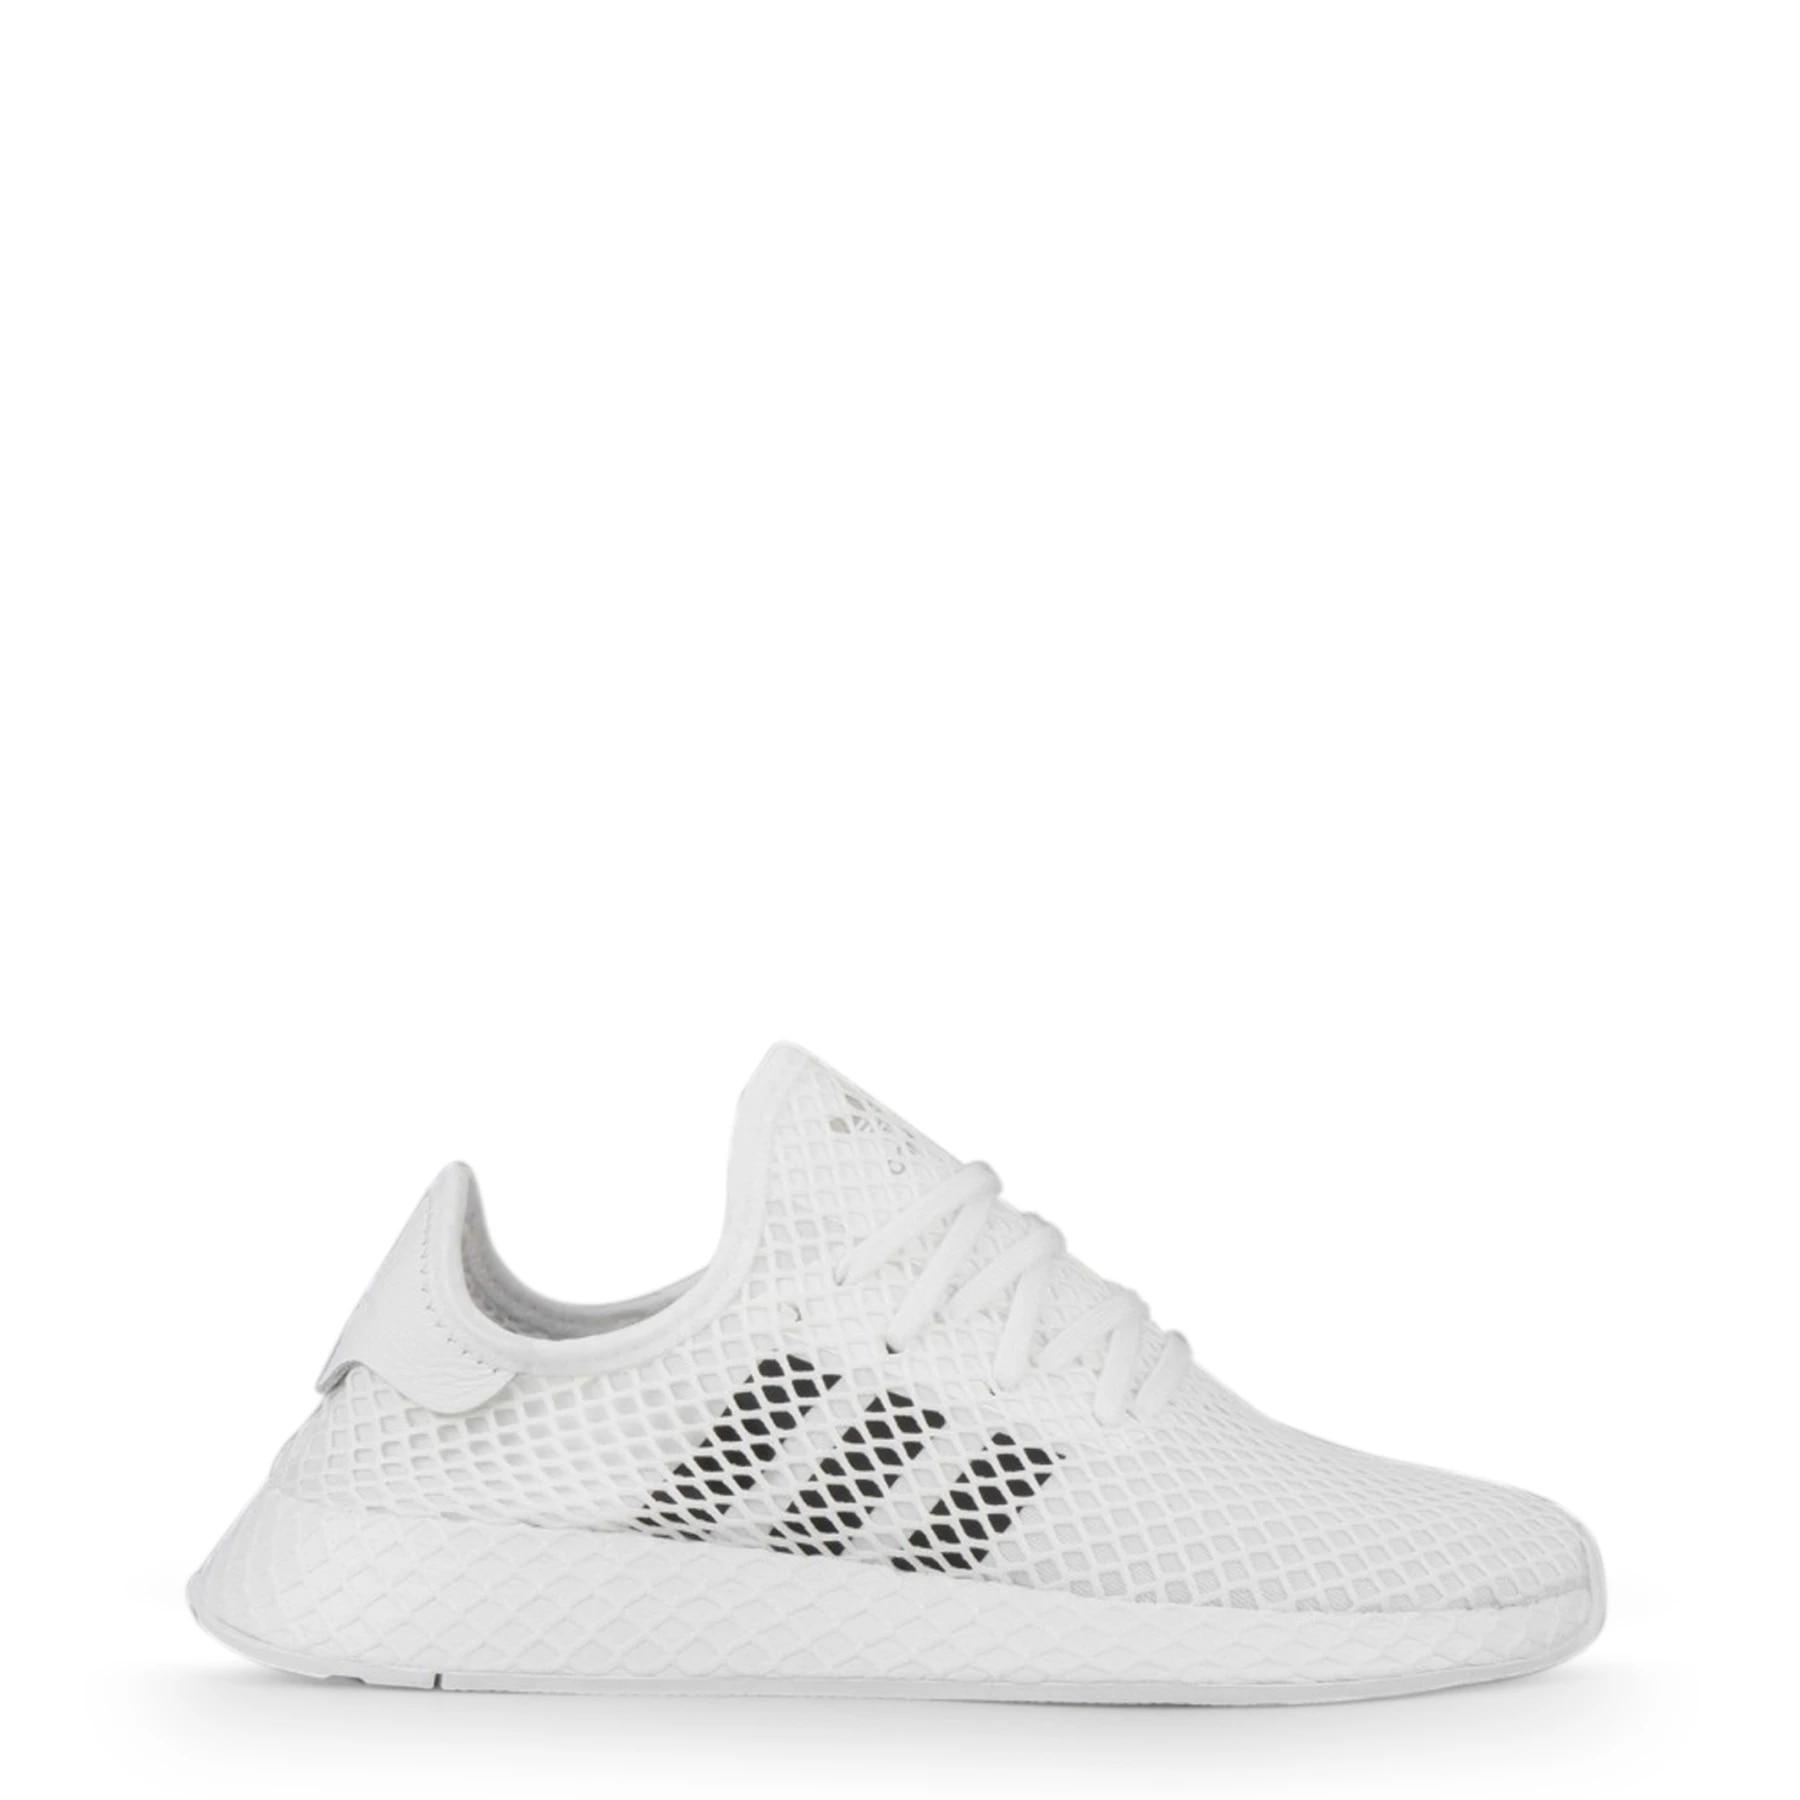 Empuje hacia abajo internacional combinar  Adidas Deerupt runner Man White 104267. Color: White, Size: UK  9.5Adidas4059814071788|Women's Vulcanize Shoes| - AliExpress